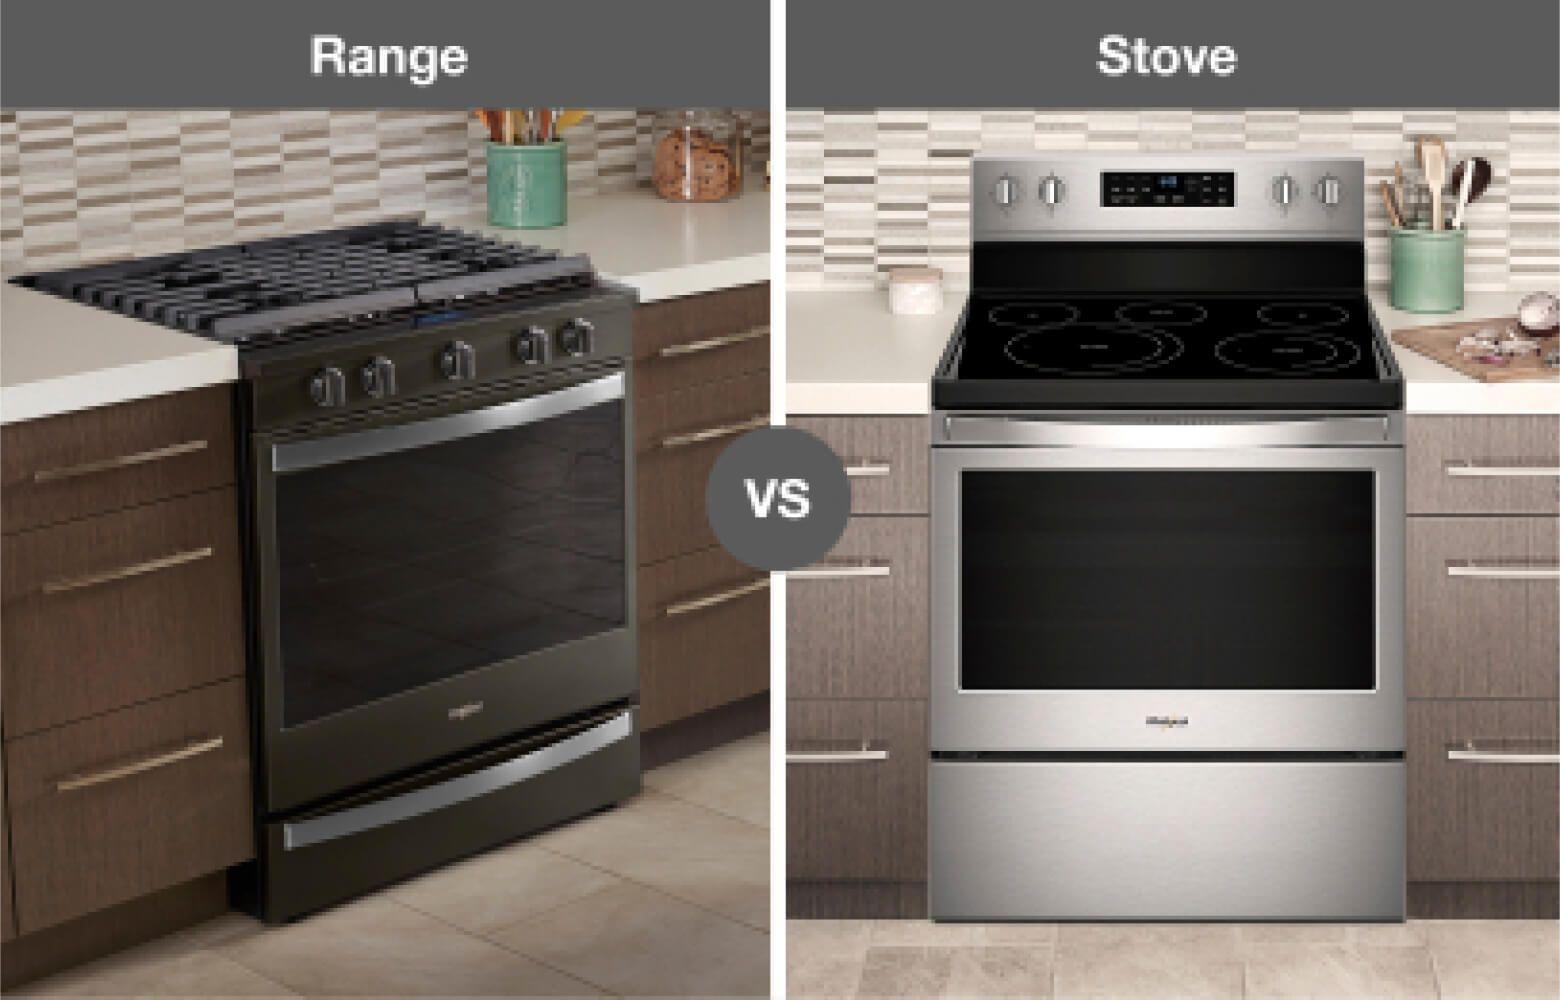 Whirlpool® kitchen range and stove